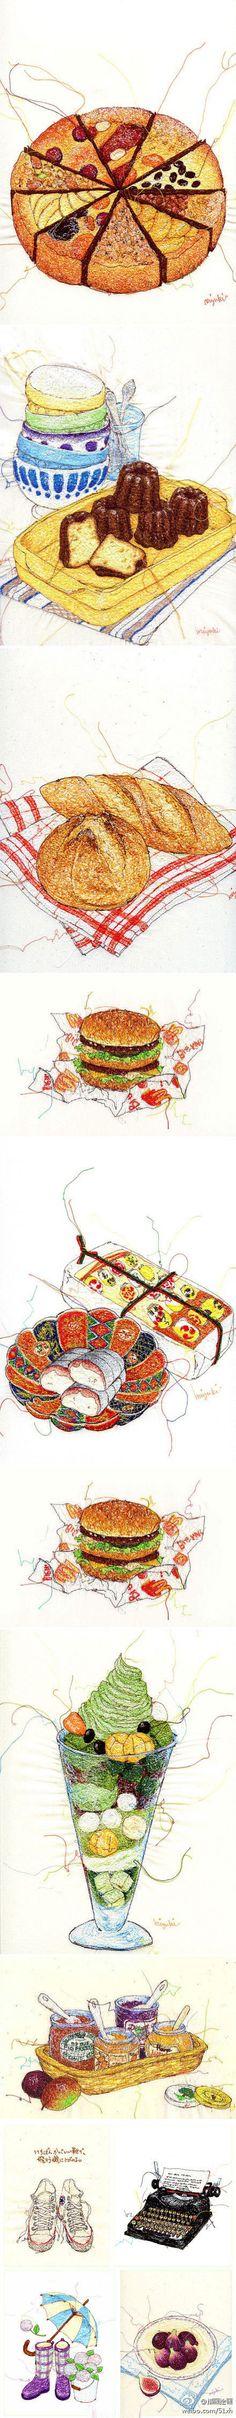 miyuki sakai- lovveeee her! Dessert Illustration, Illustration Art, Food Drawing, Painting & Drawing, Food Sketch, Watercolor Food, Food Painting, Food Journal, Kitchen Art